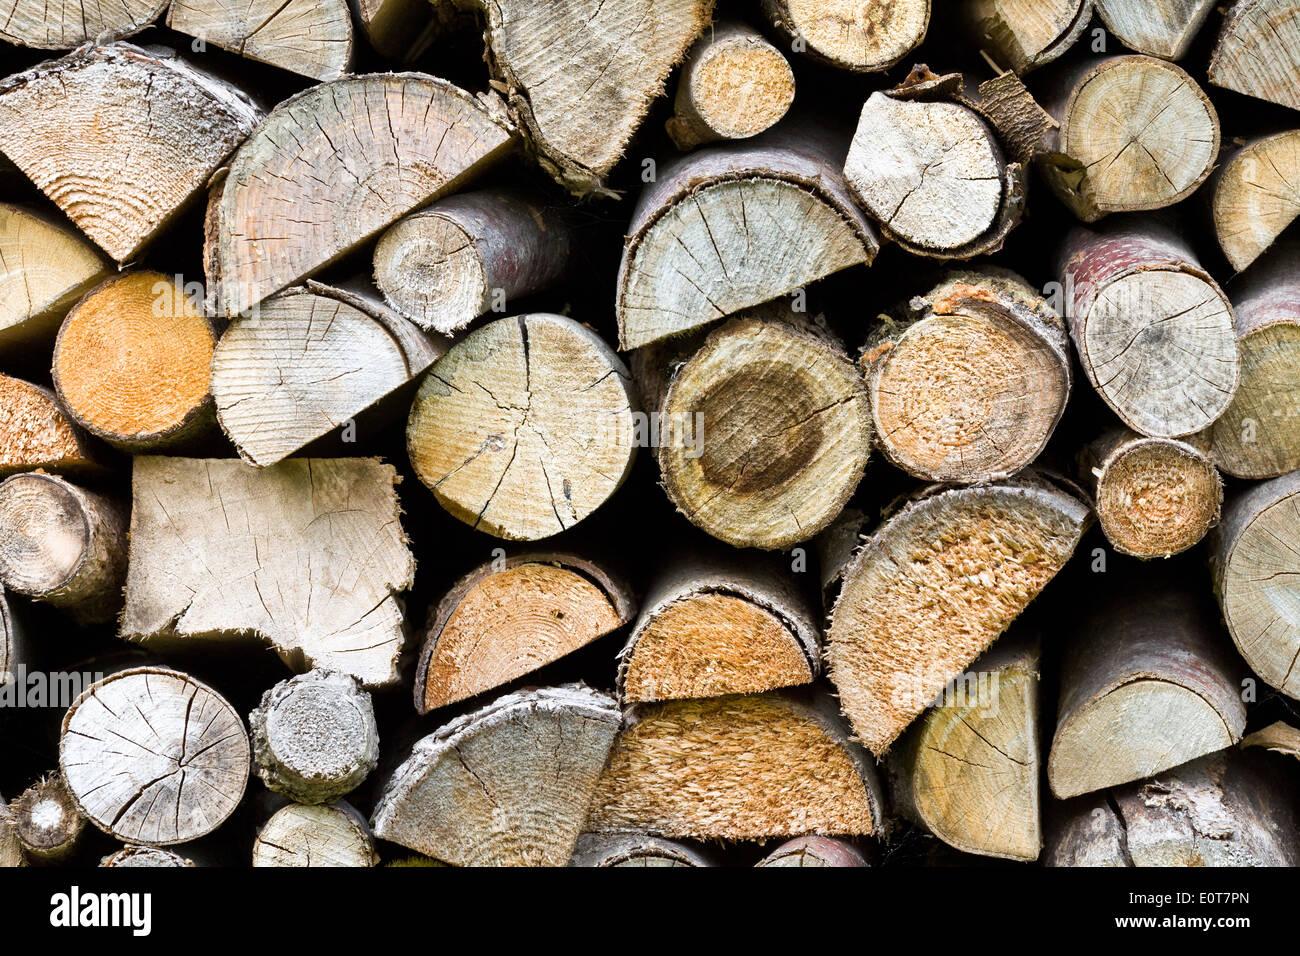 Brennholzstapel - firewood Stock Photo